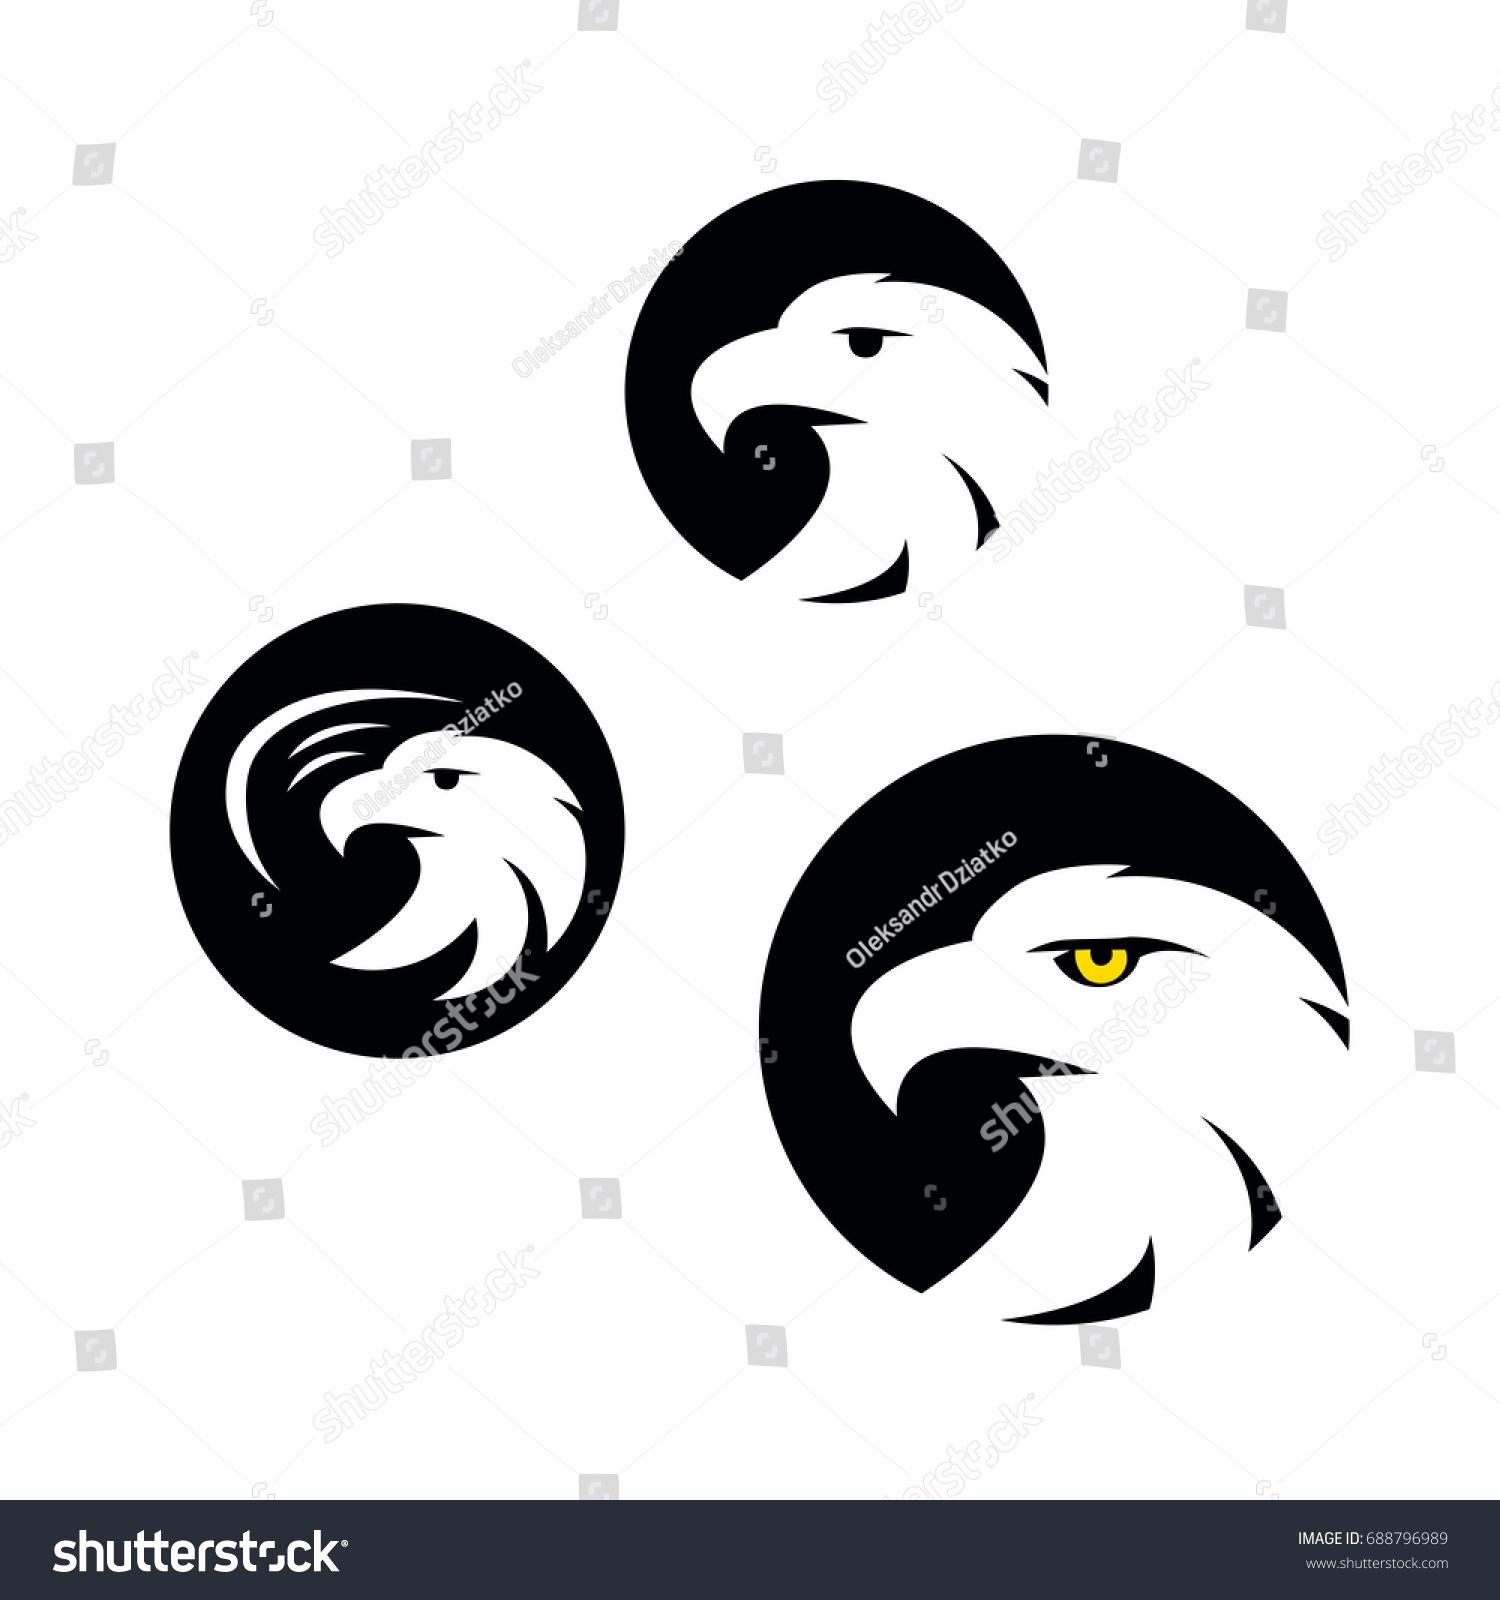 Symbol eagle hawk predator sport team stock vector 688796989 symbol of eagle hawk predator for sport team mascot company badge guard service biocorpaavc Images